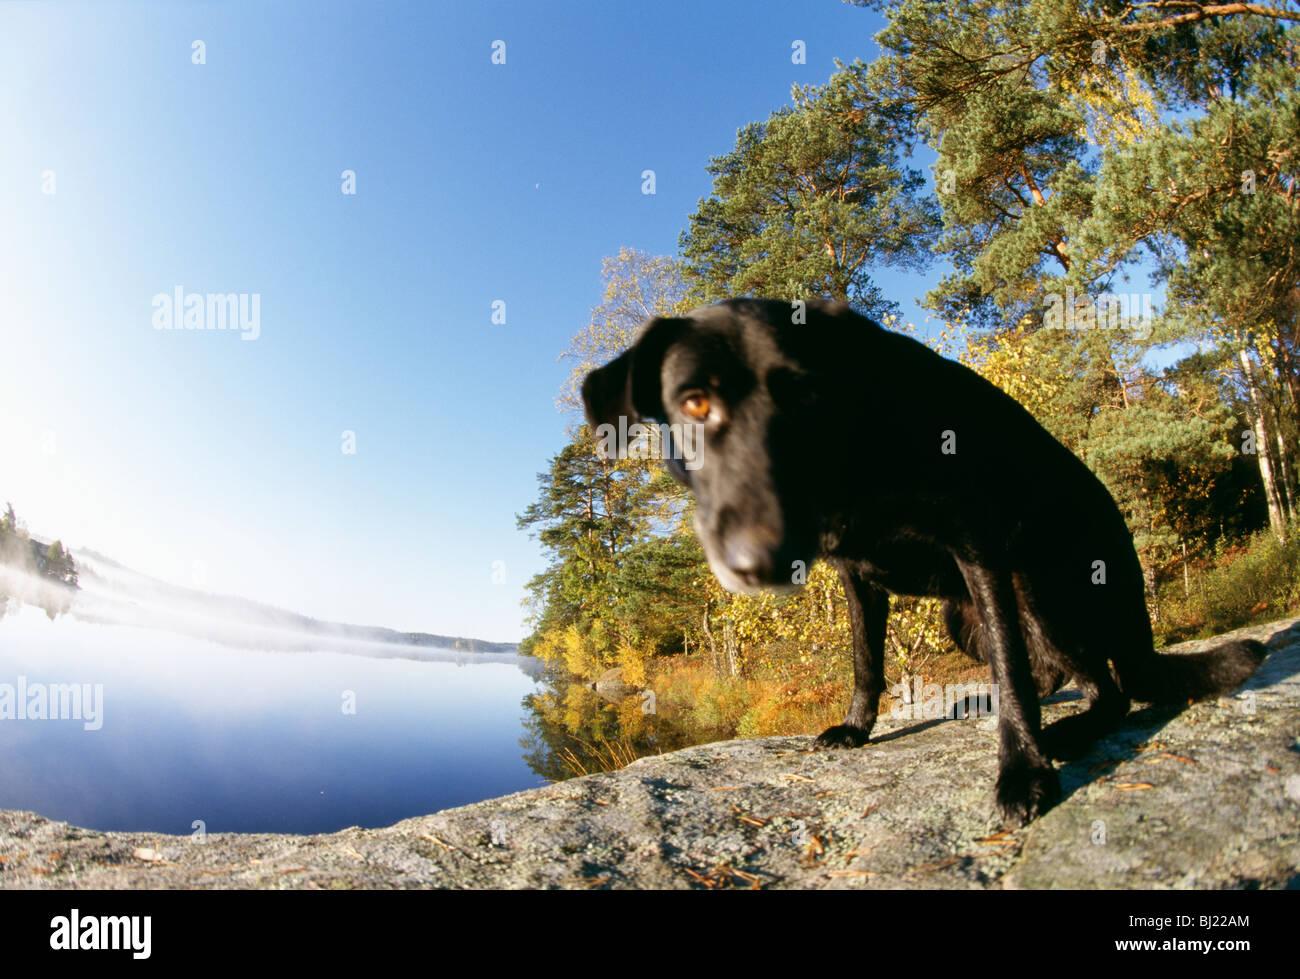 A dog by a lake - Stock Image